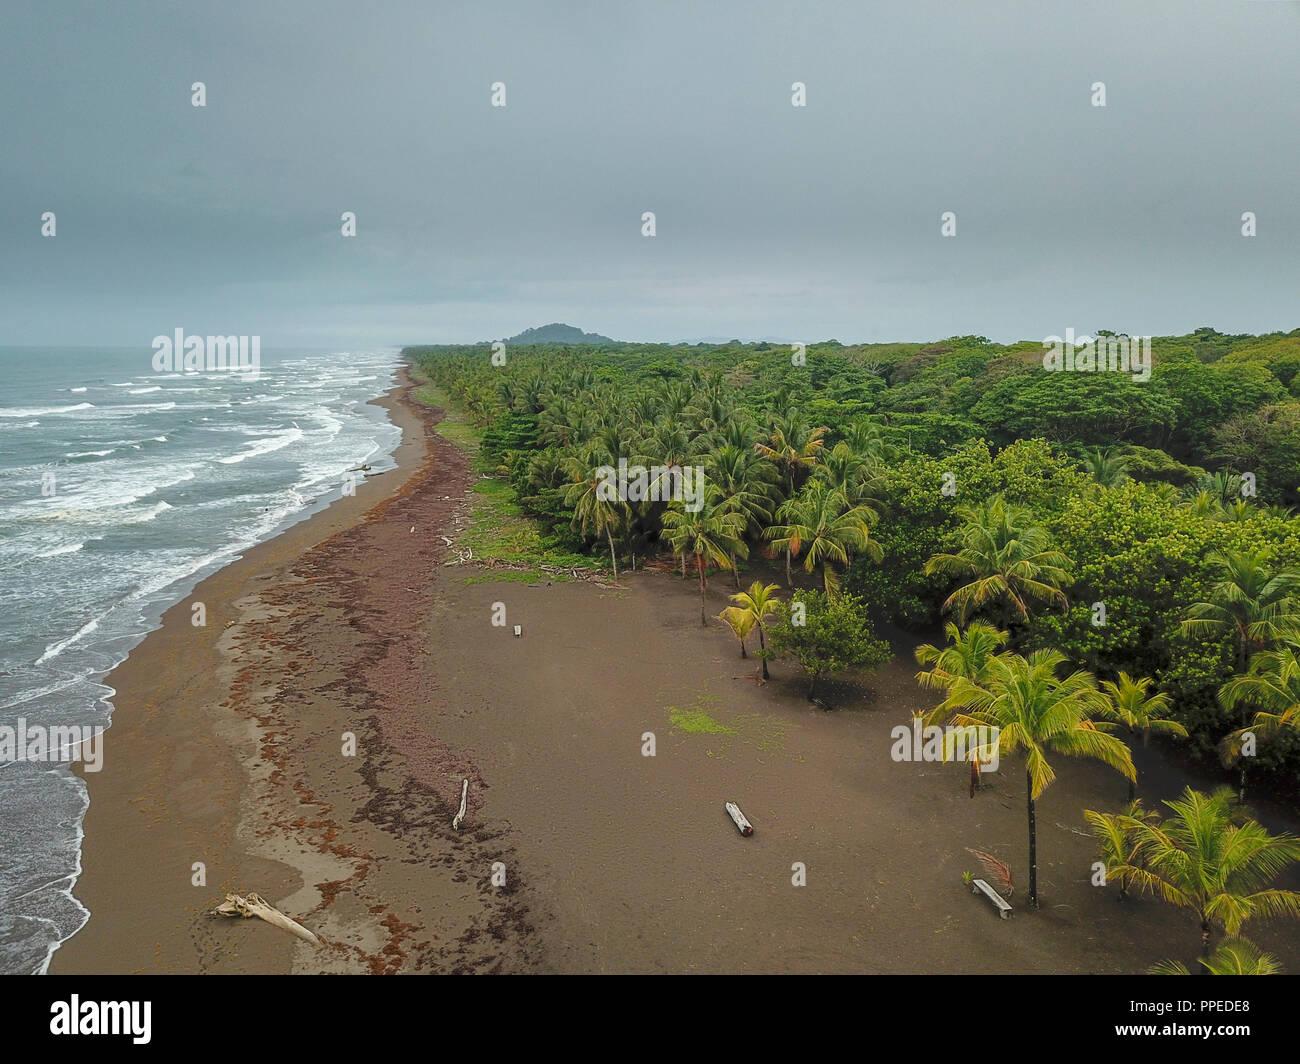 Beach, Tortuguero National Park, Costa Rica - Stock Image